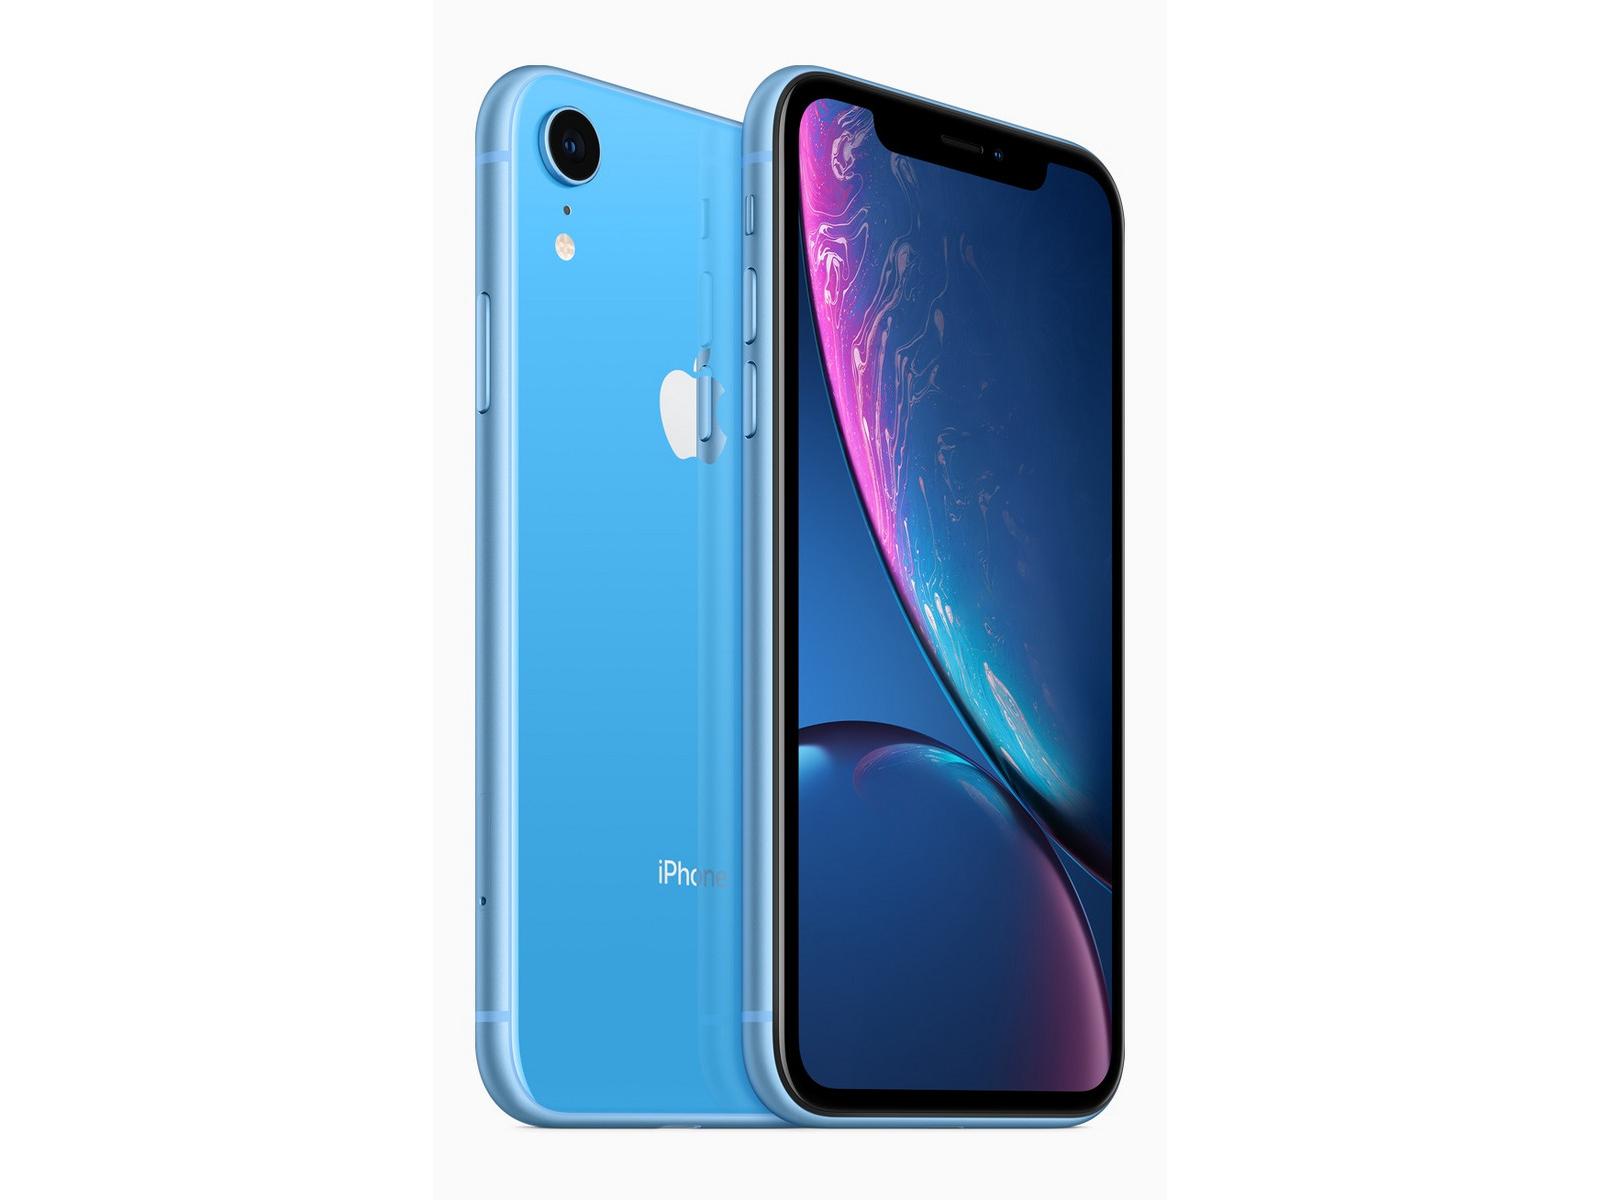 c7c6761b5 Apple iPhone serie - Notebookcheck.info